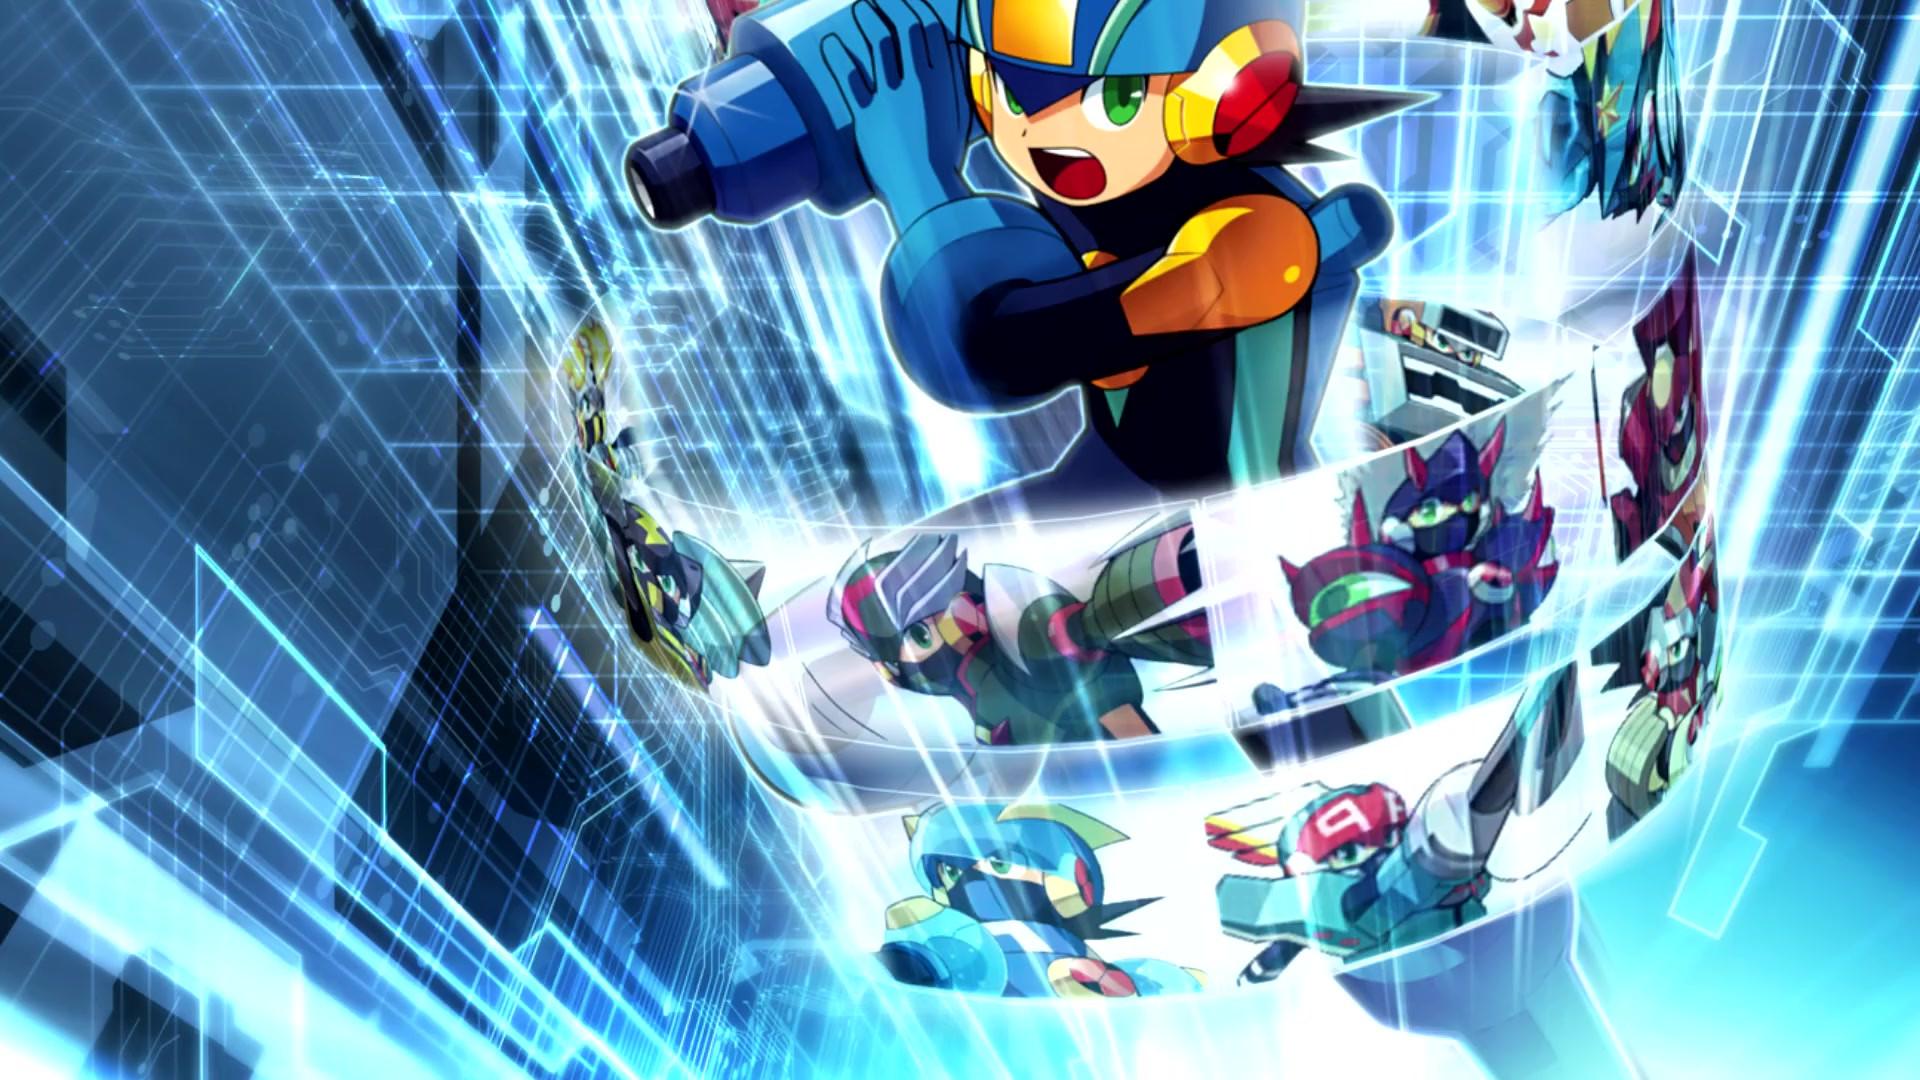 Megaman Nt Warrior Stream